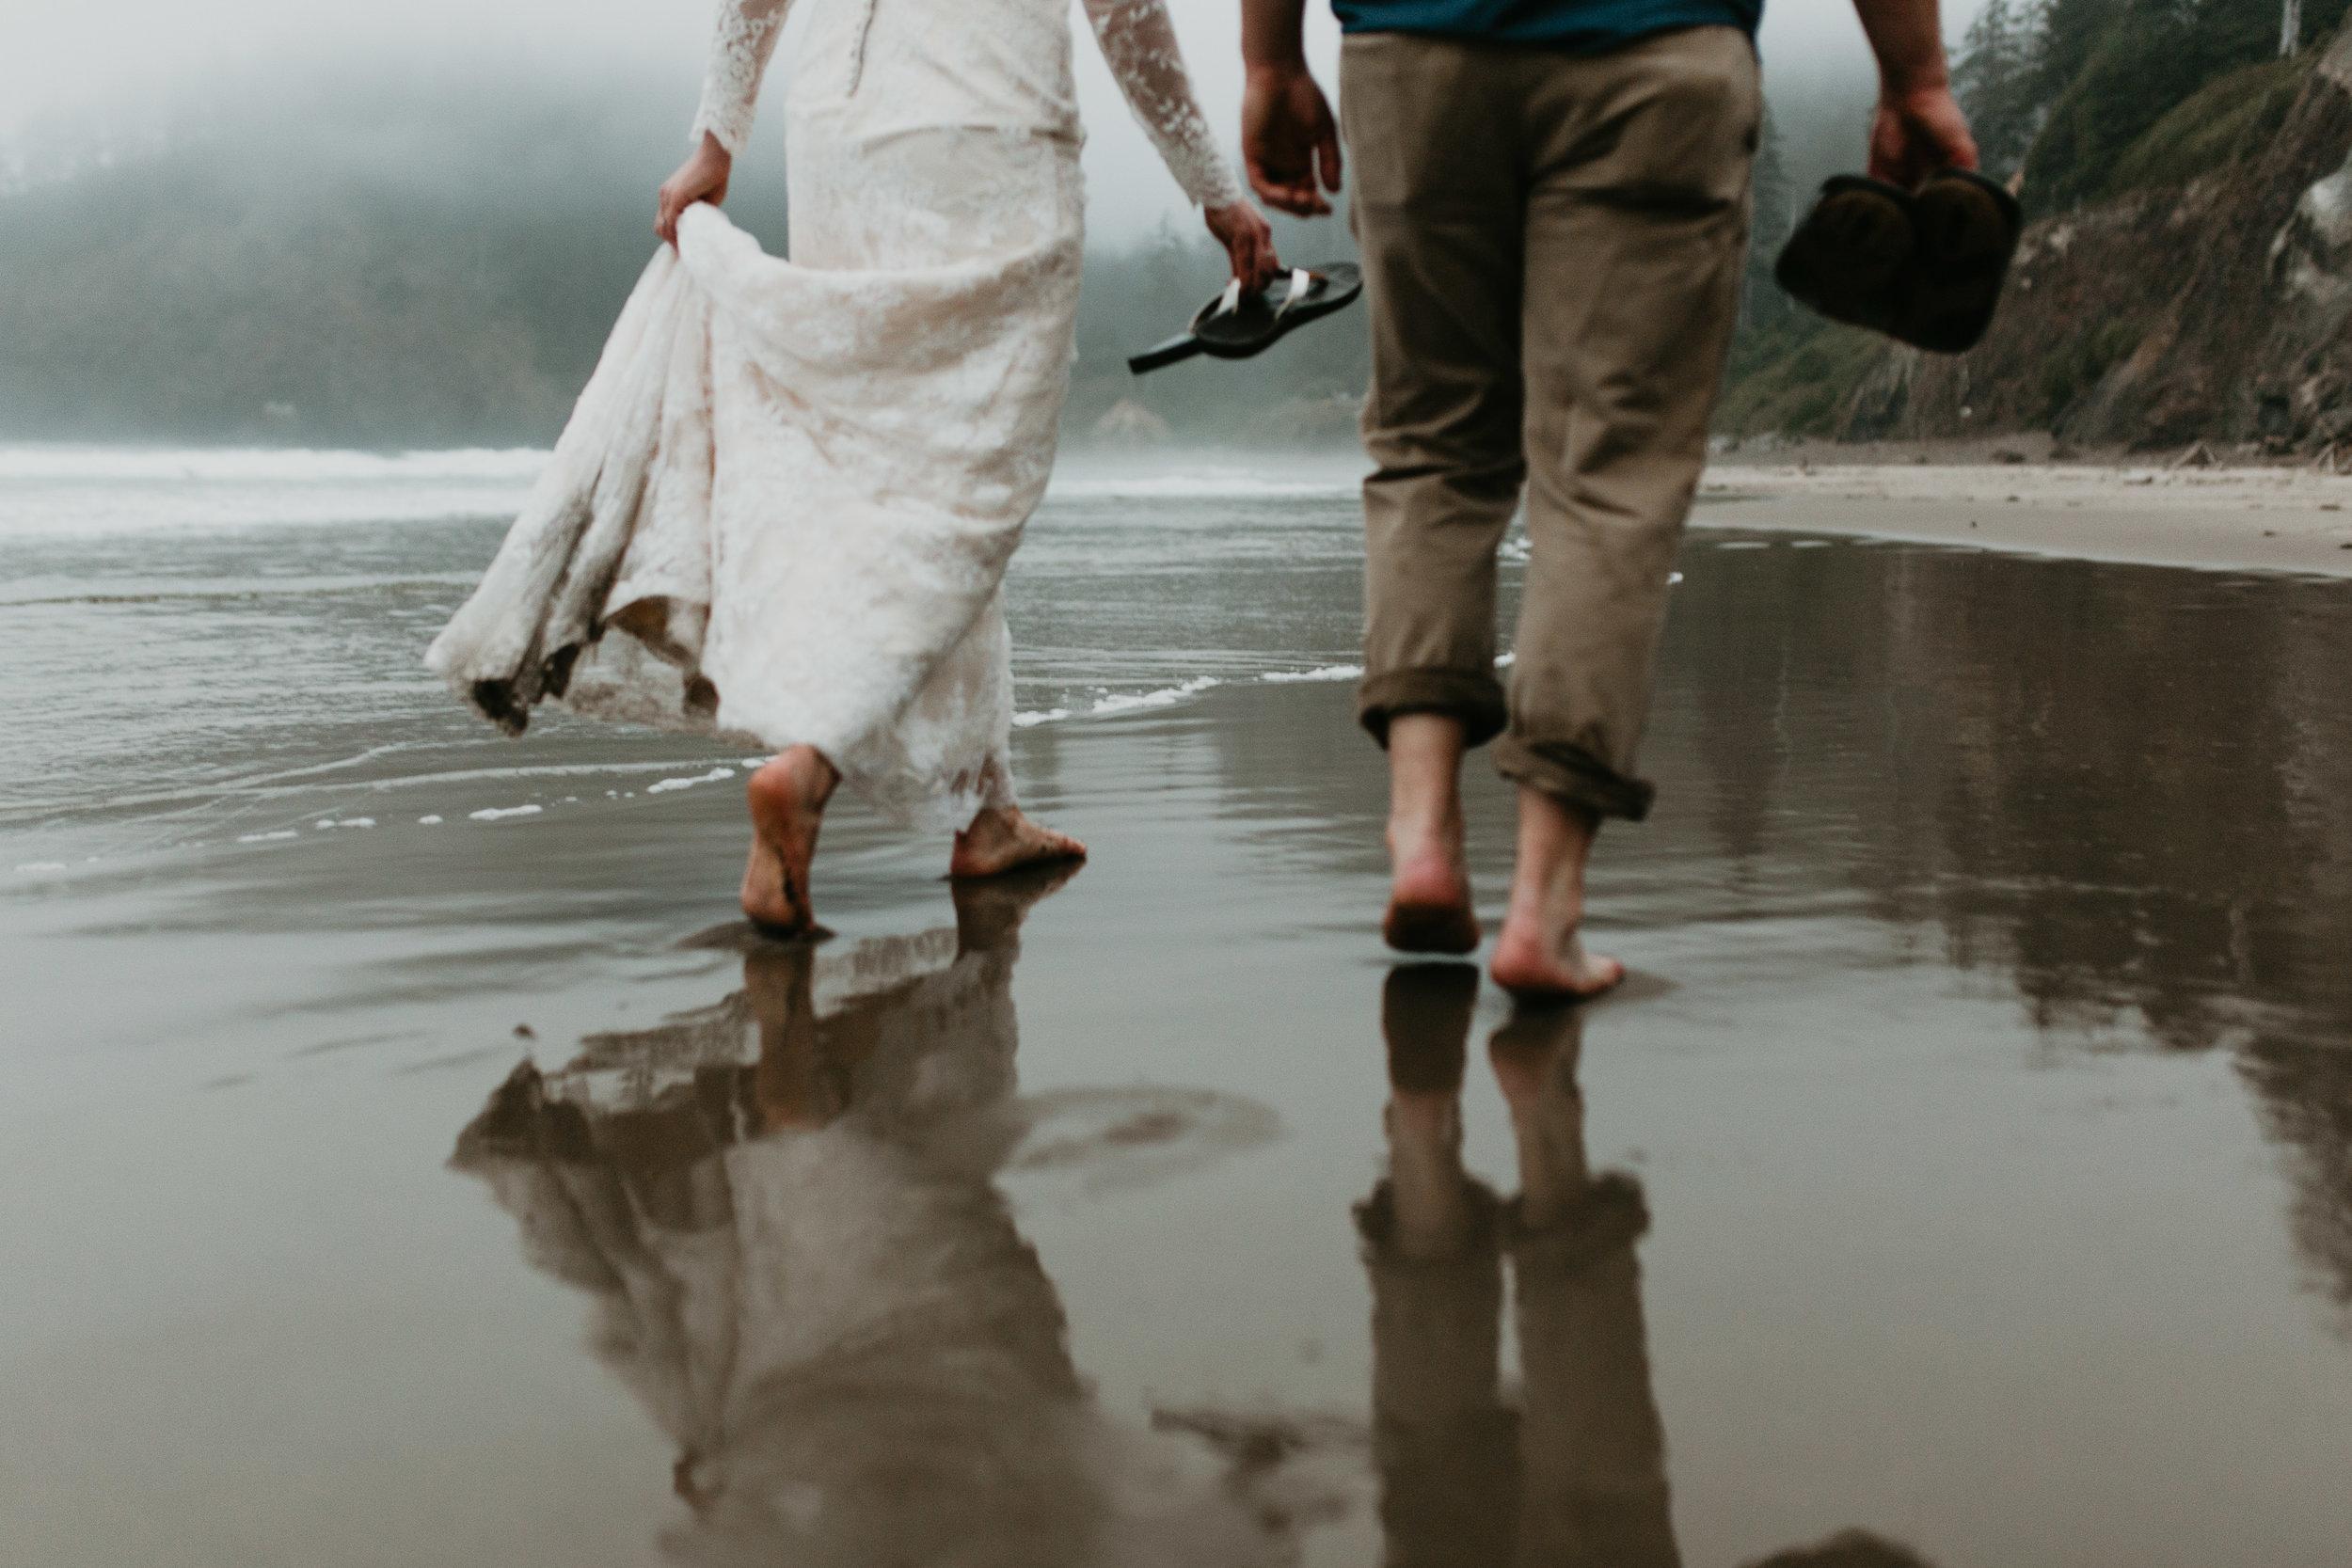 nicole-daacke-photography-ecola-state-park-oregon-elopement-bridal-photos-photographer-for-cannon-beach-elopement-oregon-coast-elopement-photographer-foggy-summer-elopement-cannon-beach-best-adventure-elopement-photographer-7146.jpg